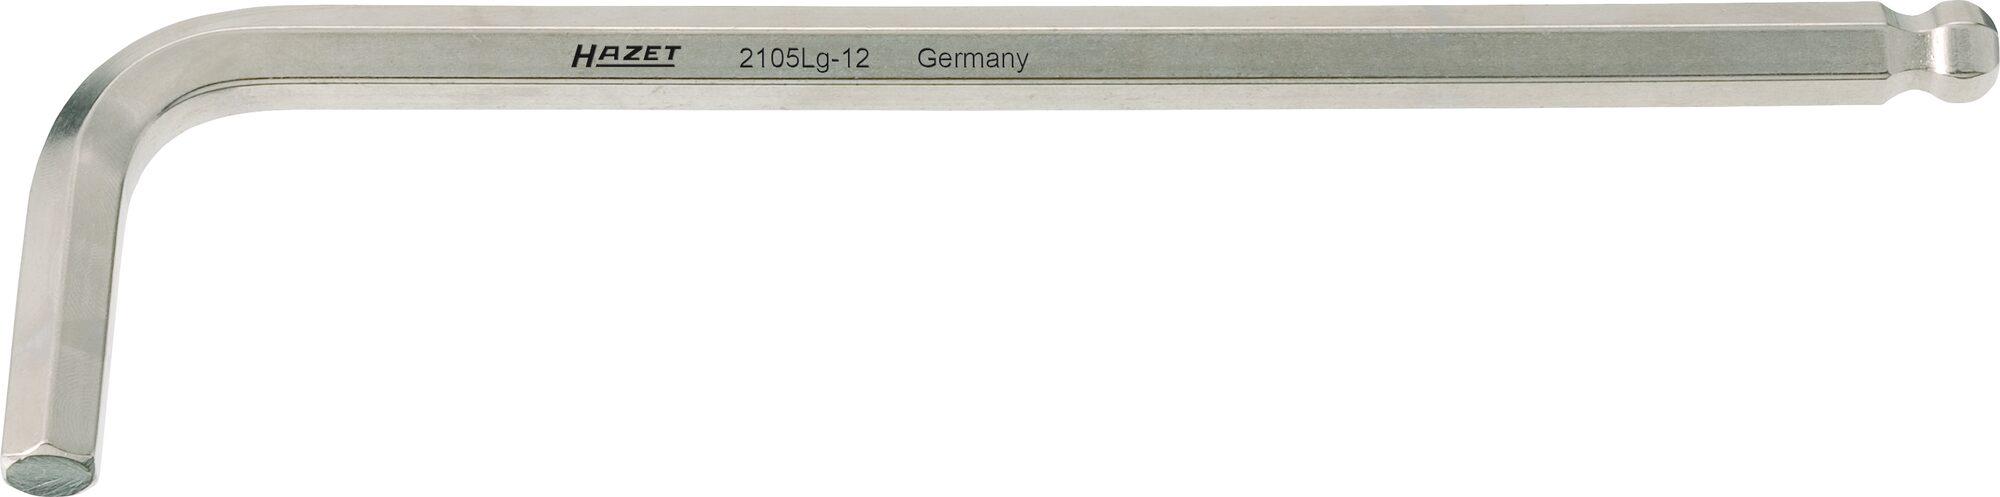 HAZET Winkelschraubendreher 2105LG-015 ∙ Innen-Sechskant Profil ∙ 1.5 mm